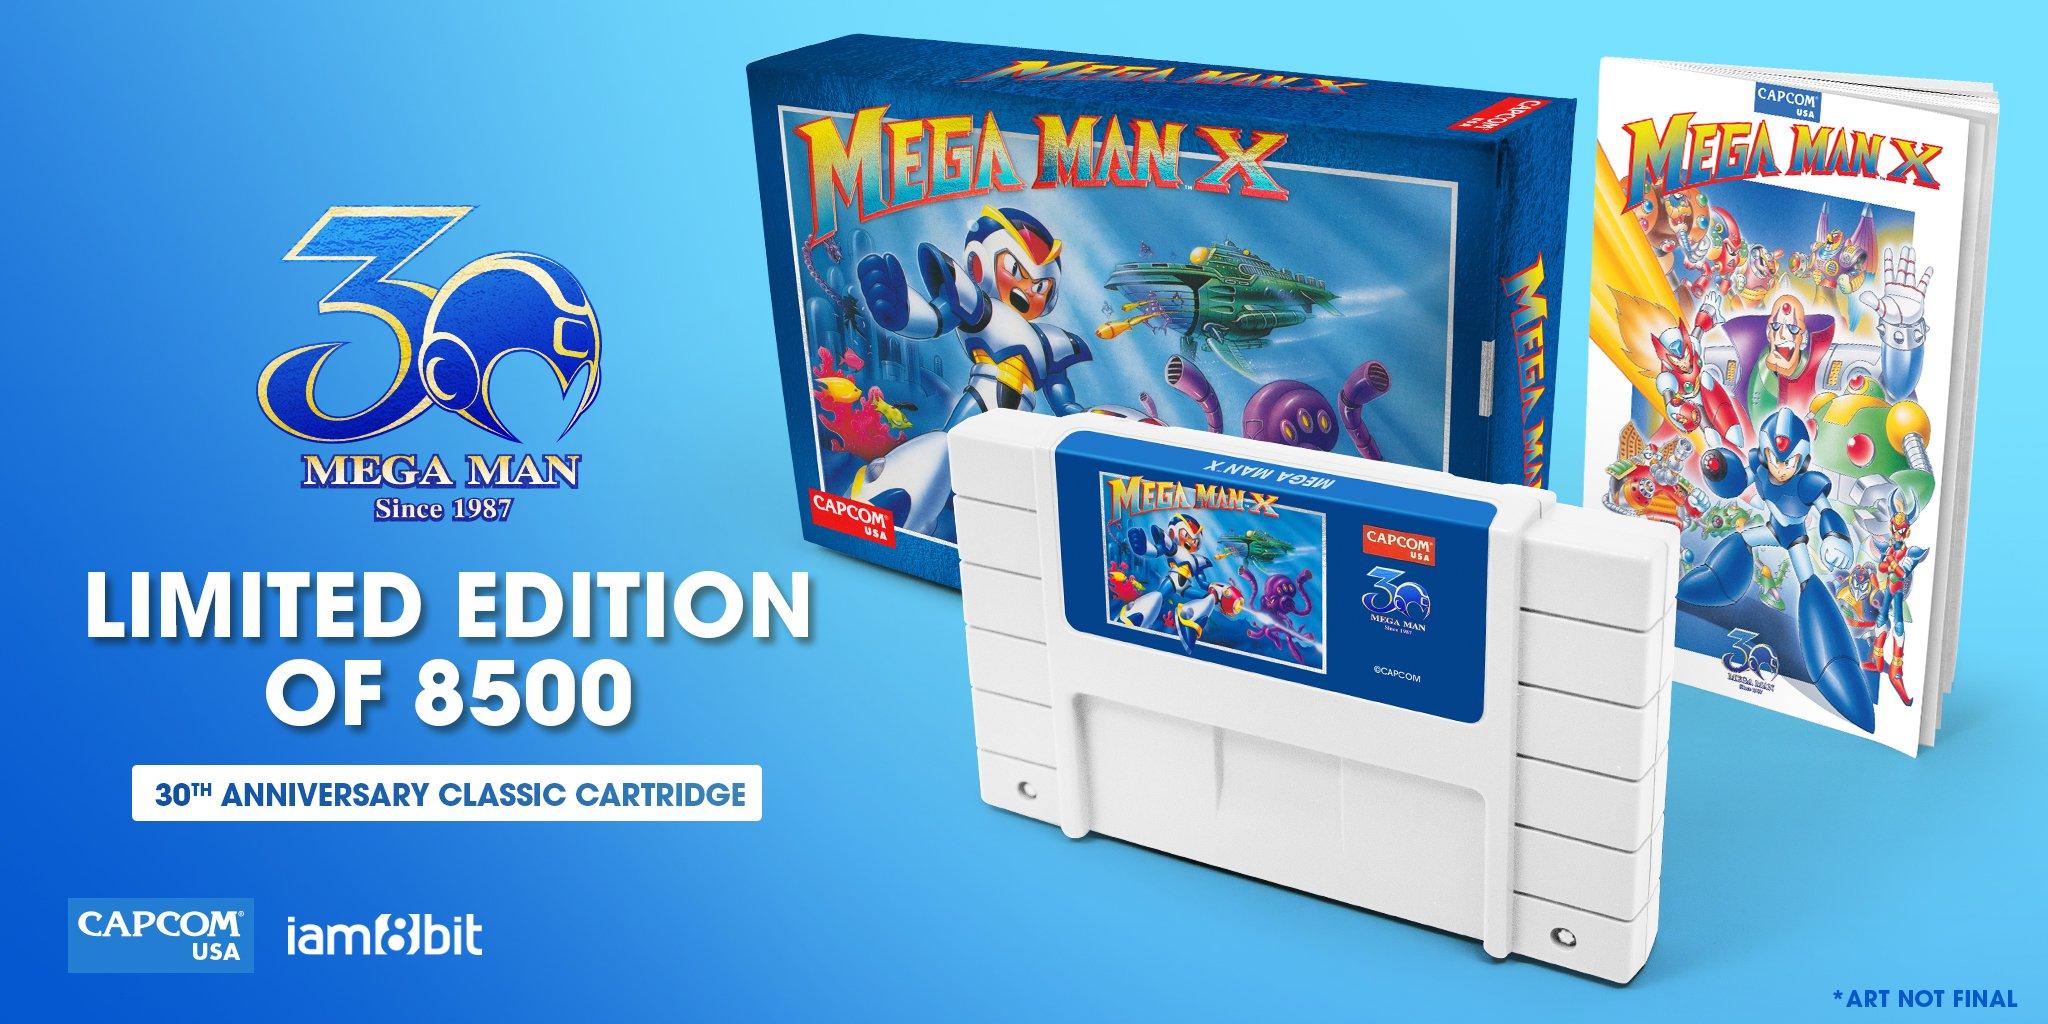 03-Mega_Man_X-30th_Anniversary_Classic_Cartridge.JPG